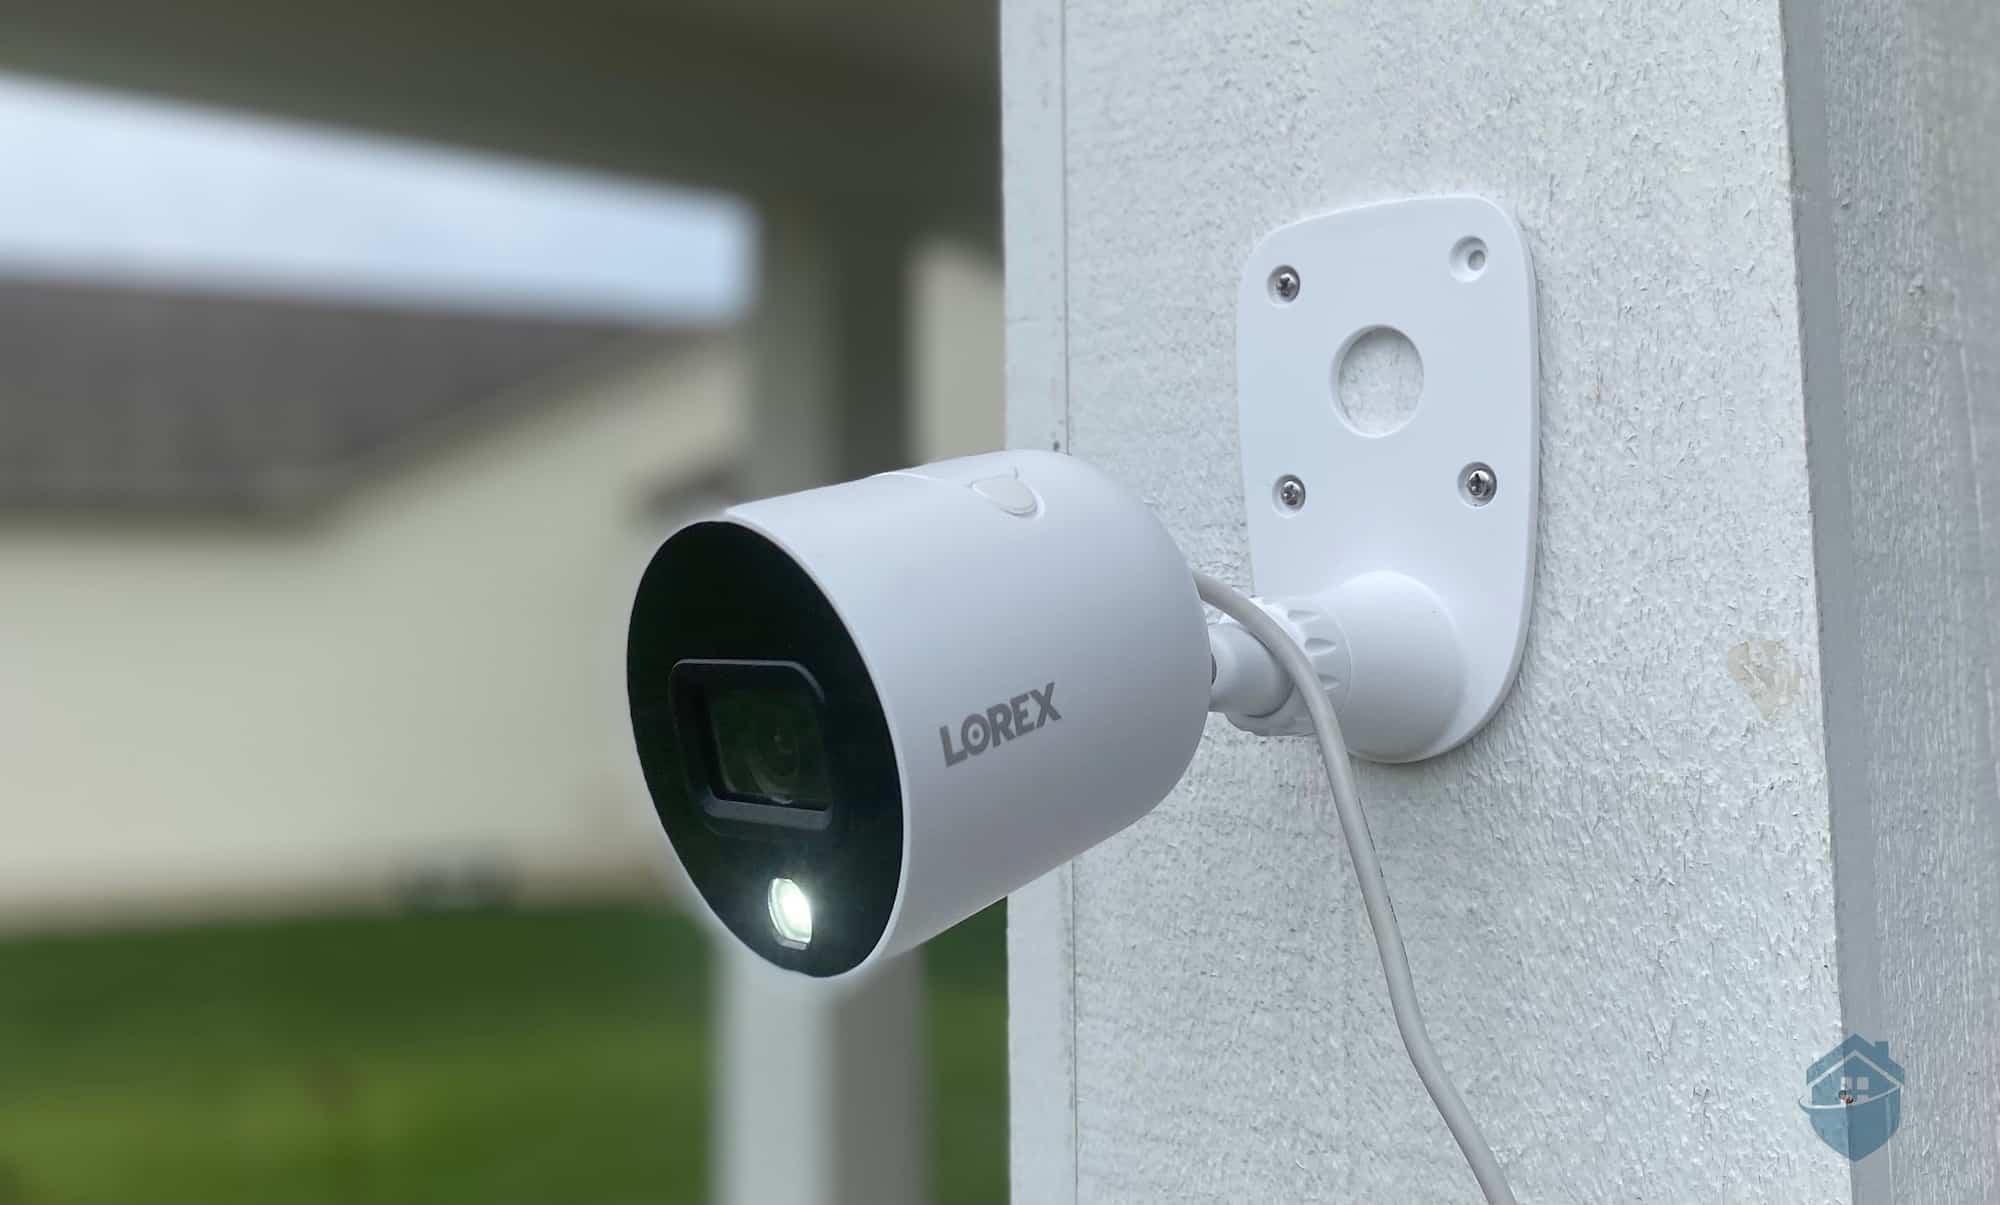 Lorex Outdoor Camera Installed